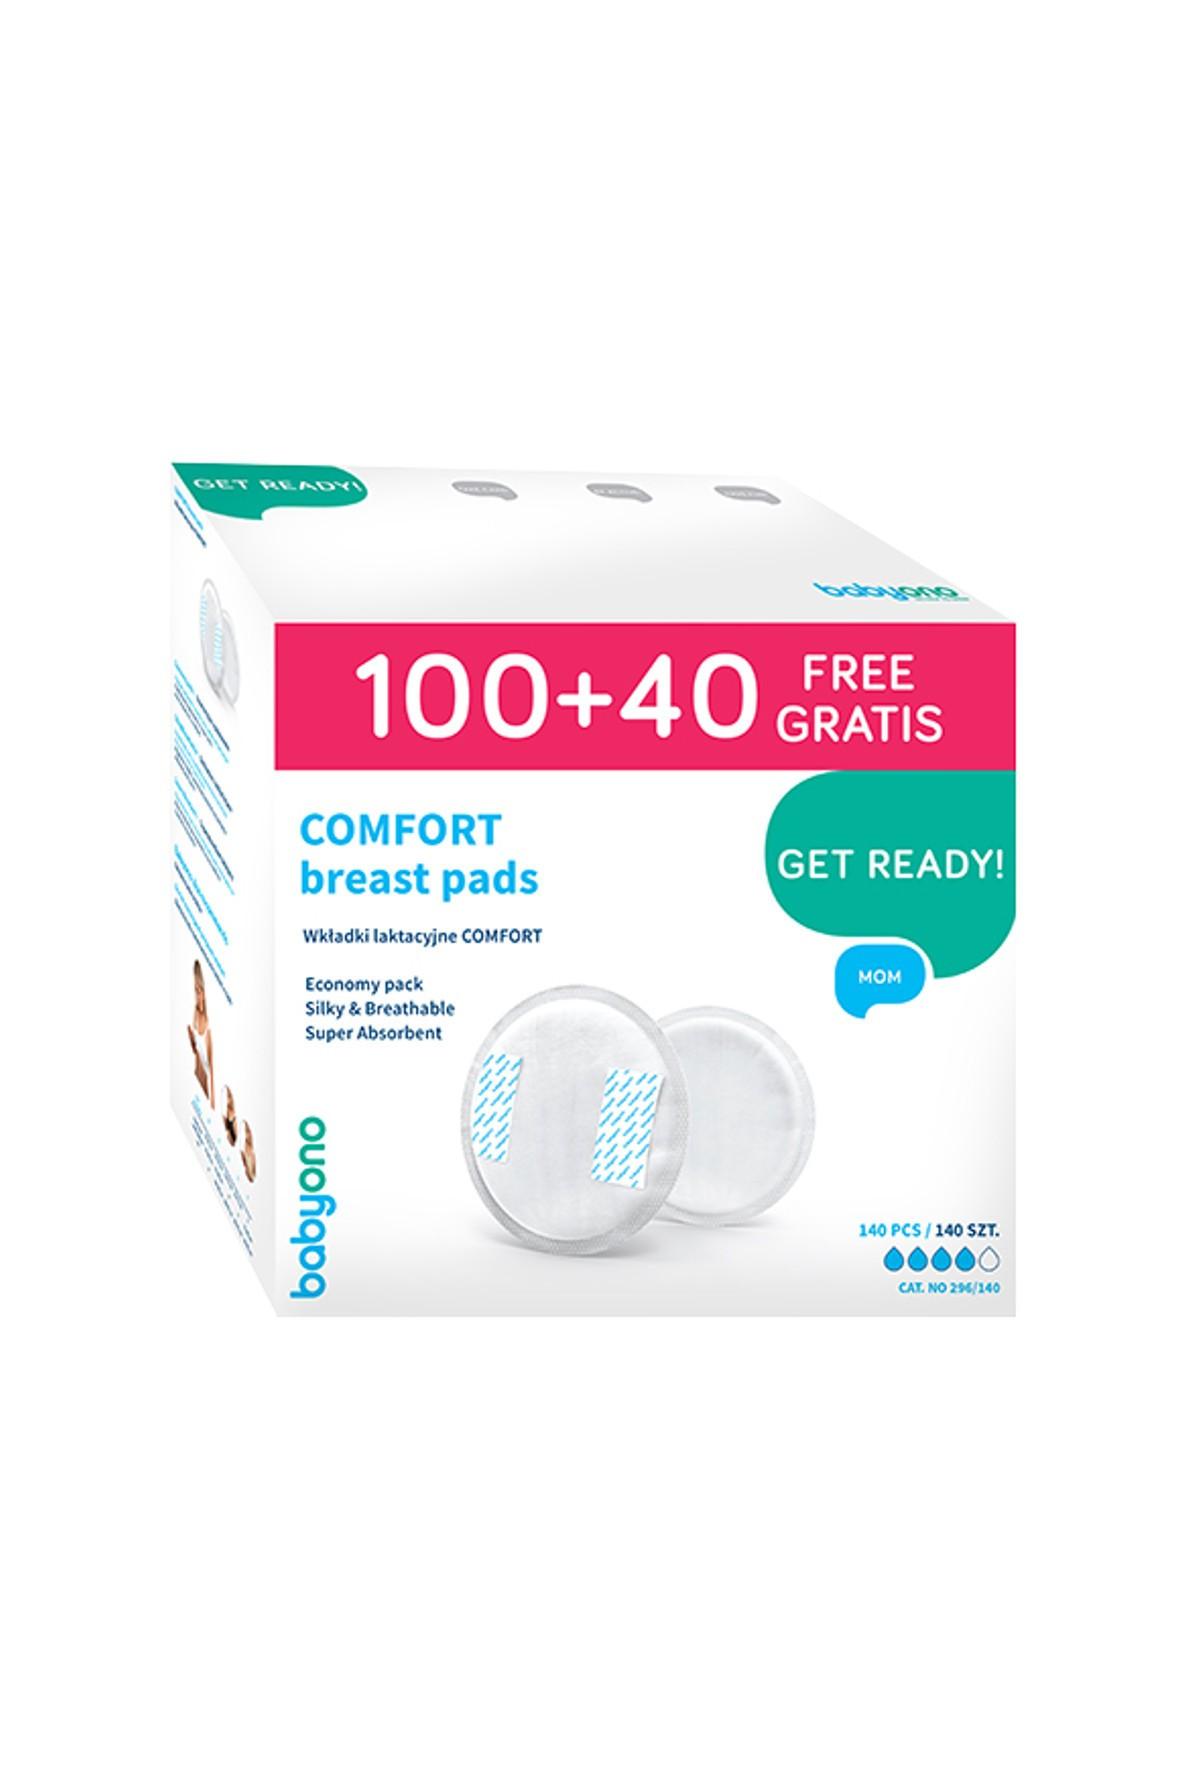 Wkładki laktacyjne Comfort 100    + 40 Gratis